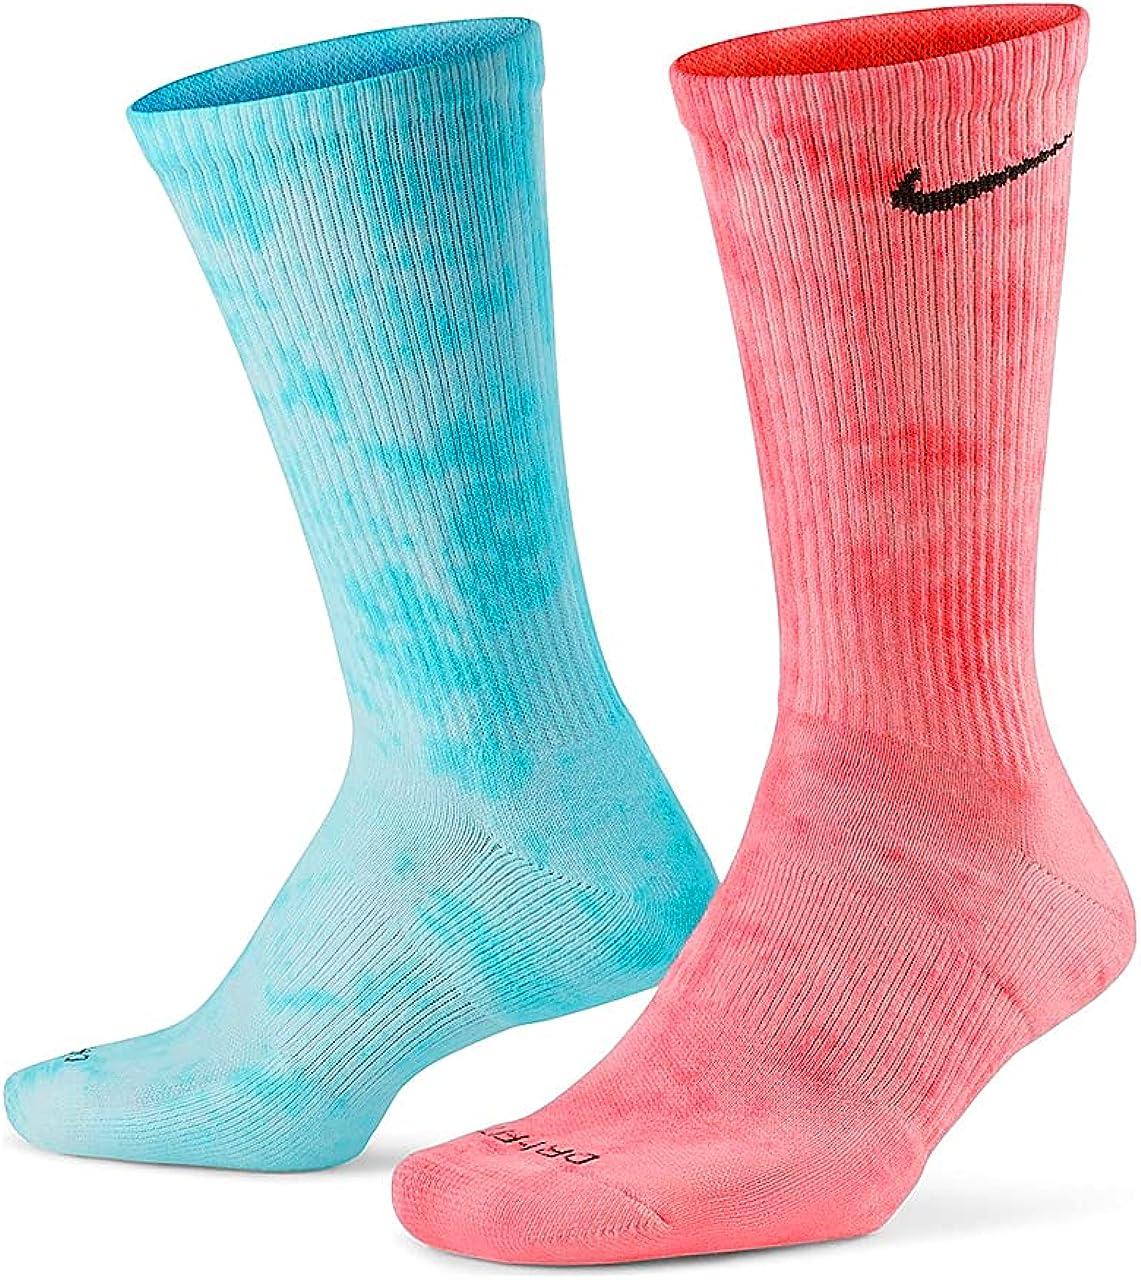 Tie Dye Nike Dri-Fit Crew Socks - Red Blue / Green Sapphire / Yellow Orange